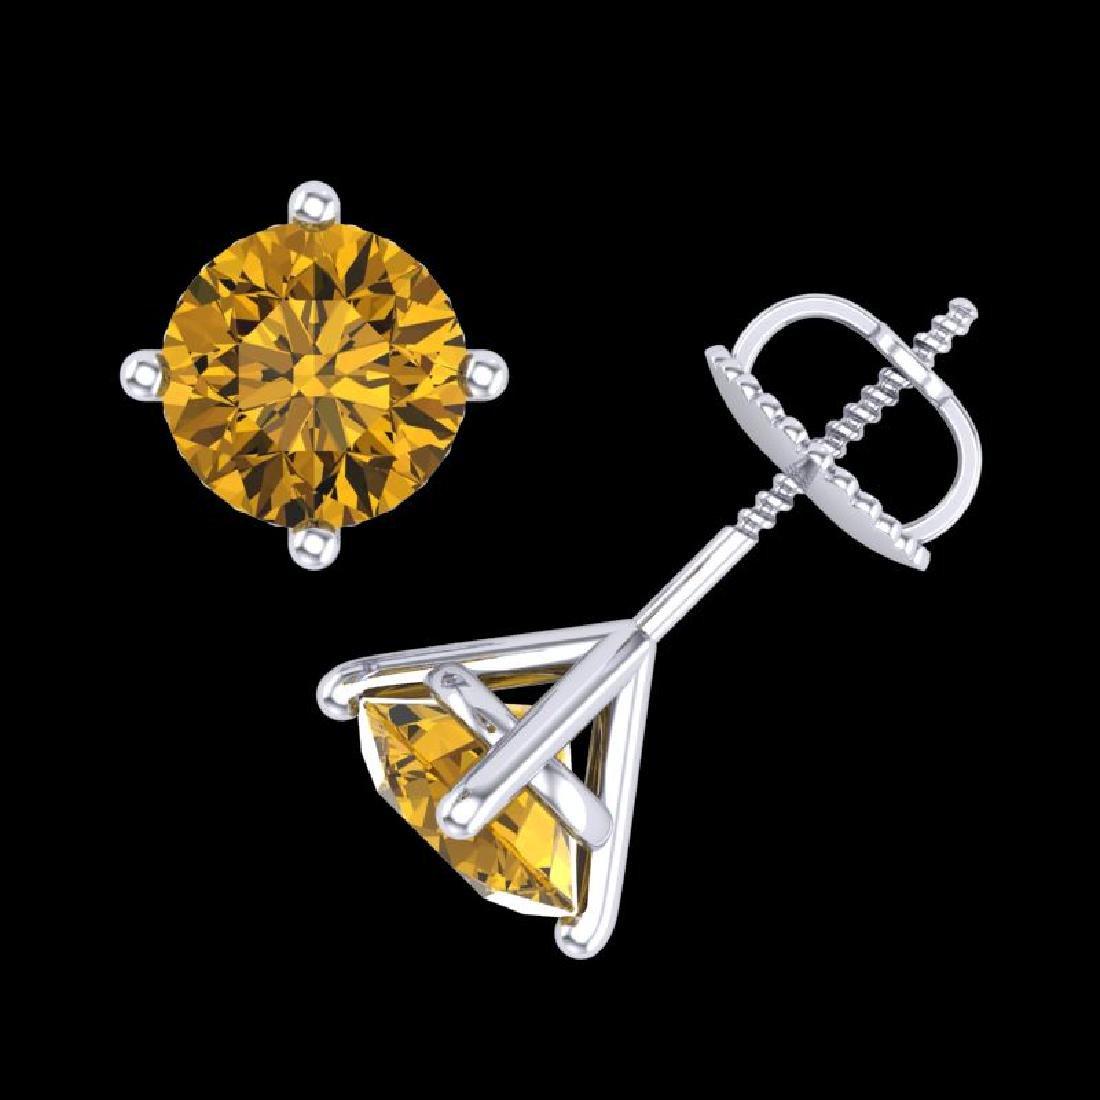 2 CTW Intense Fancy Yellow Diamond Art Deco Stud - 3